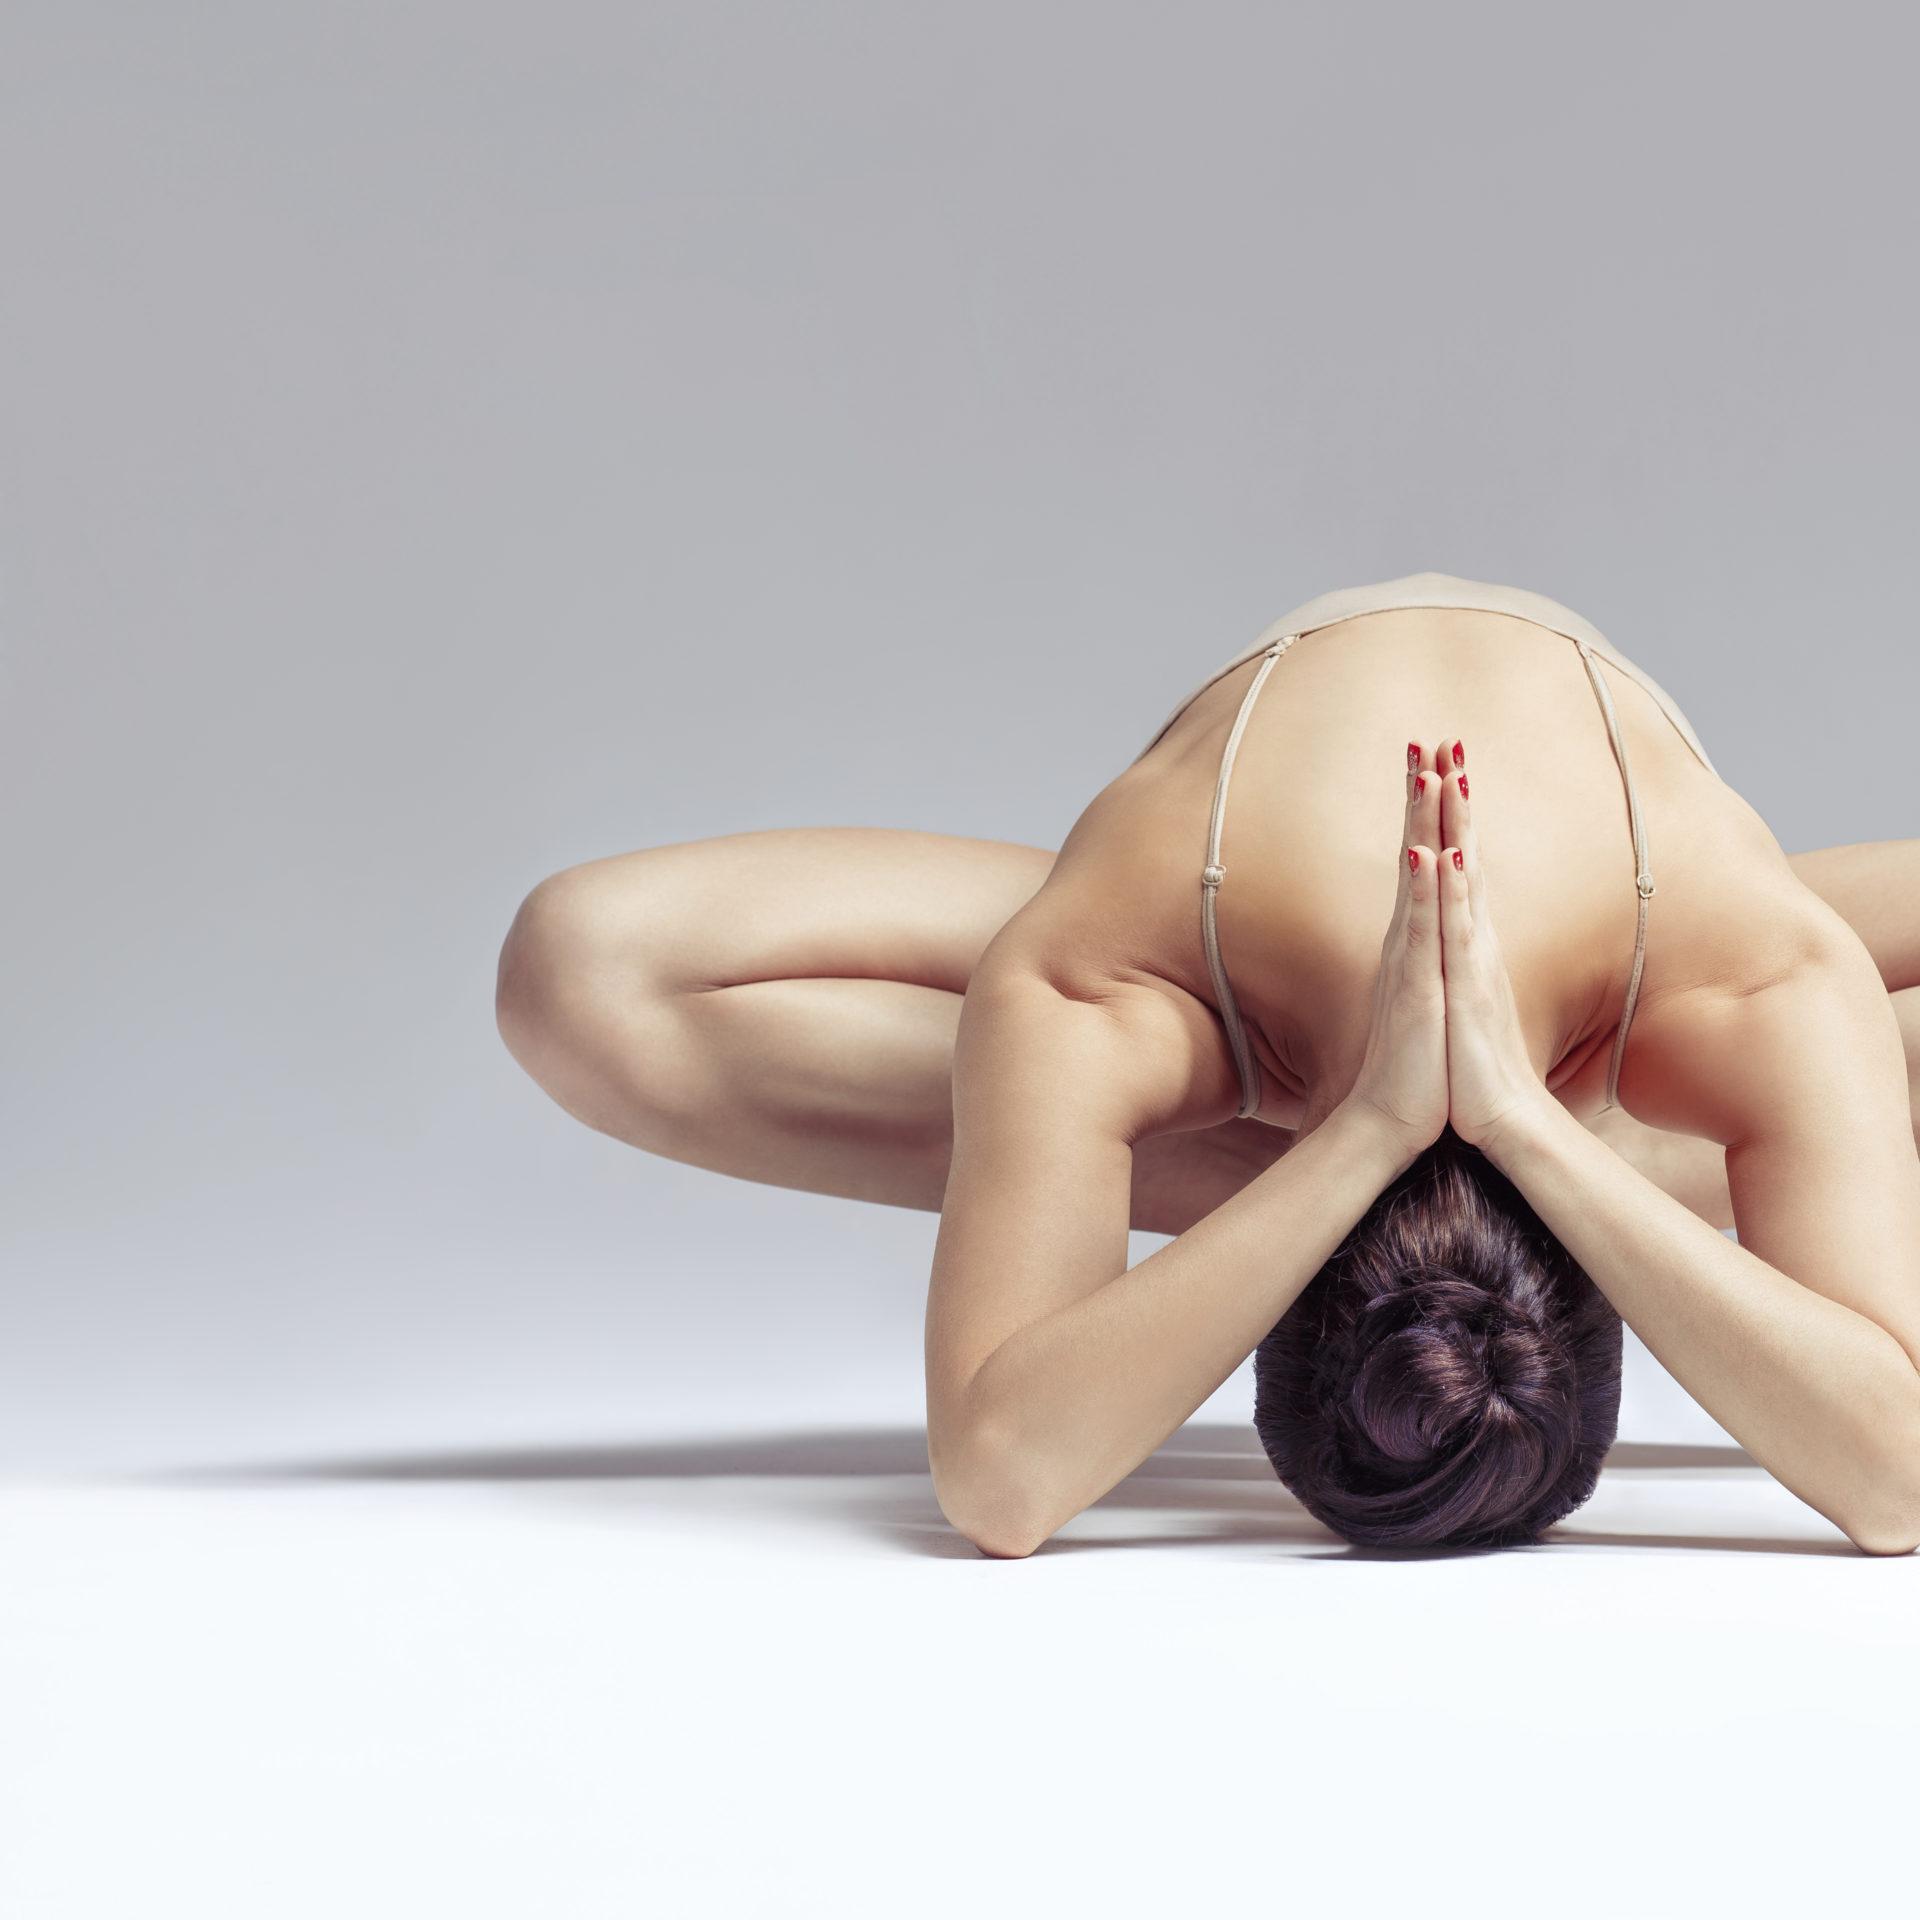 yoga woman posing like a pretzel